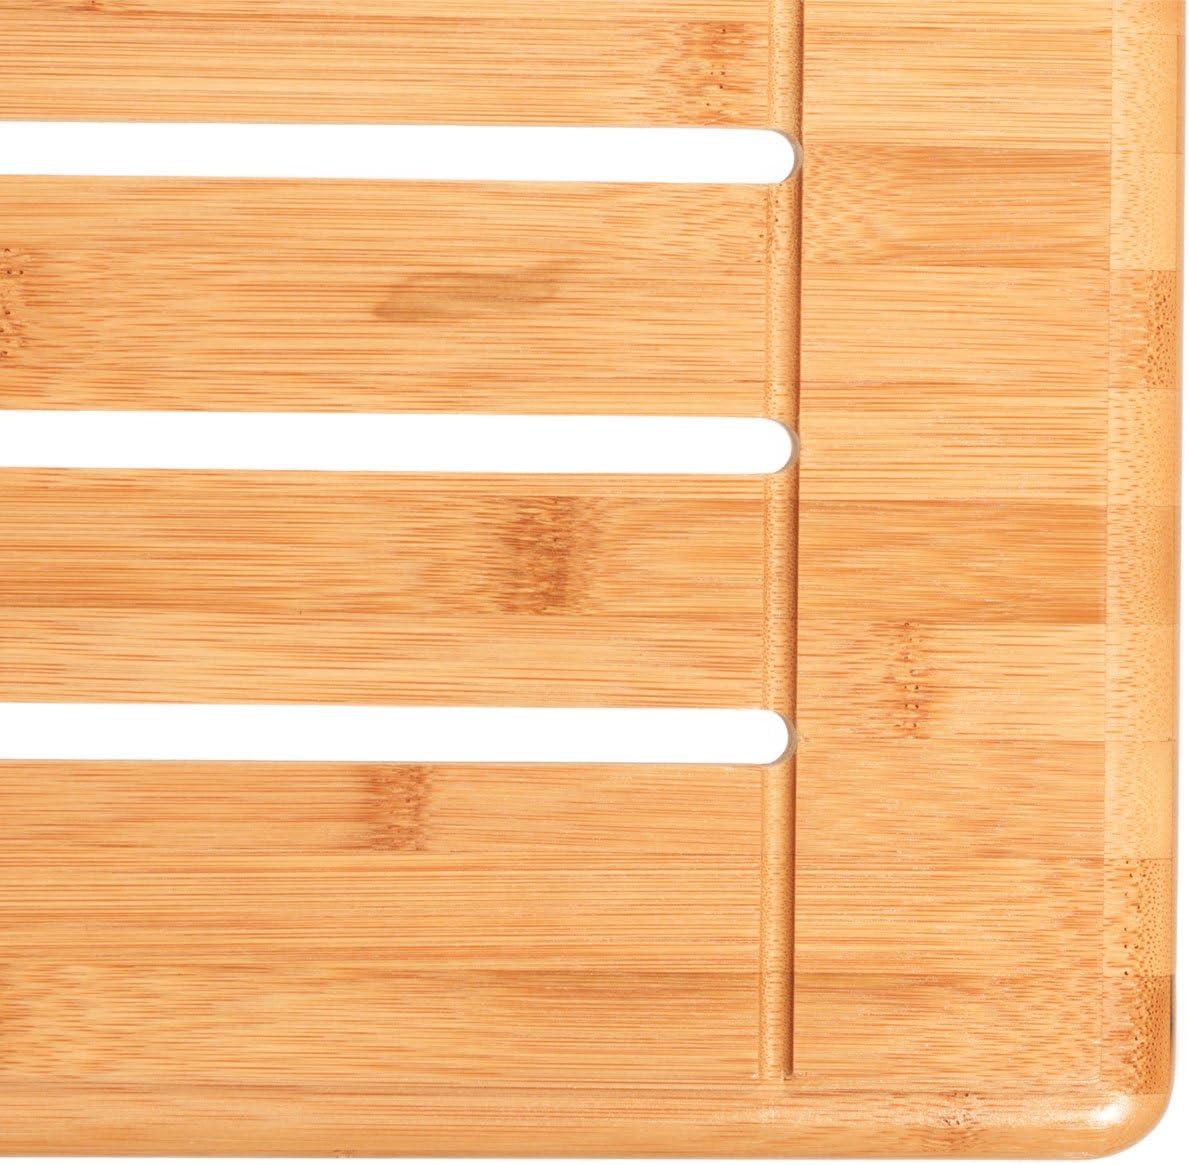 50 x 100cm Videx-Balkonklapptisch Bambusholz